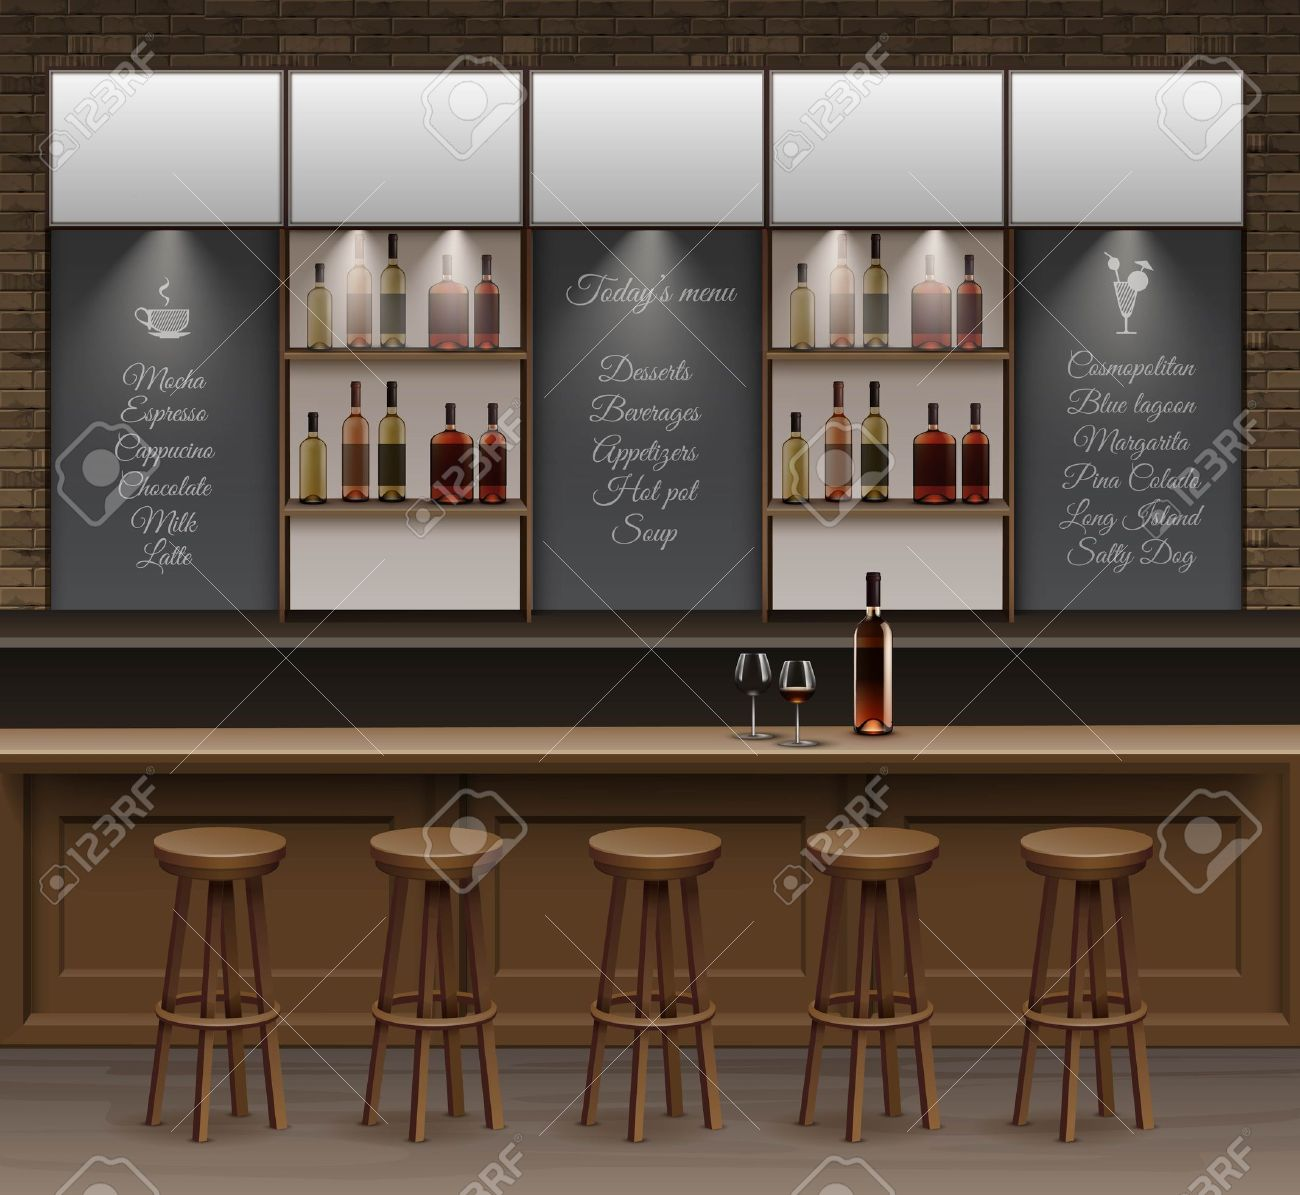 Interior wooden shelves free vector - Illustration Of Bar Cafe Beer Cafeteria Counter Desk Interior Stock Vector 48489758